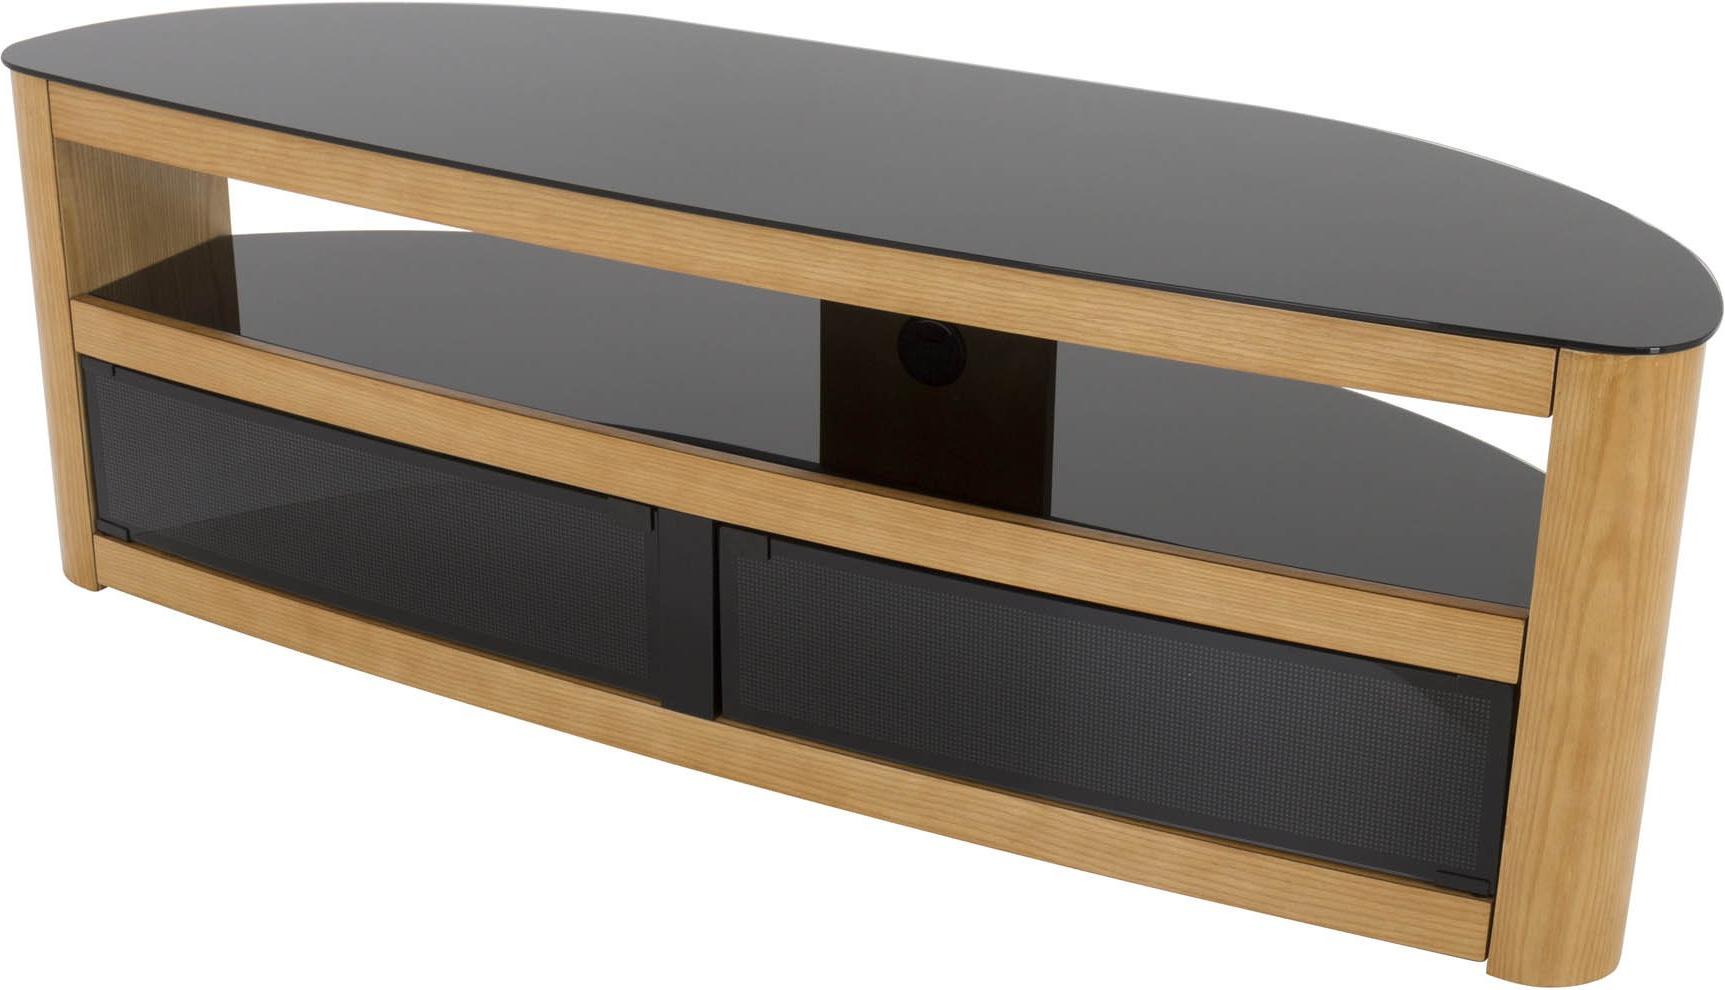 Favorite Oak Tv Stands Inside Avf Fs1500Buro Tv Stands (View 3 of 20)